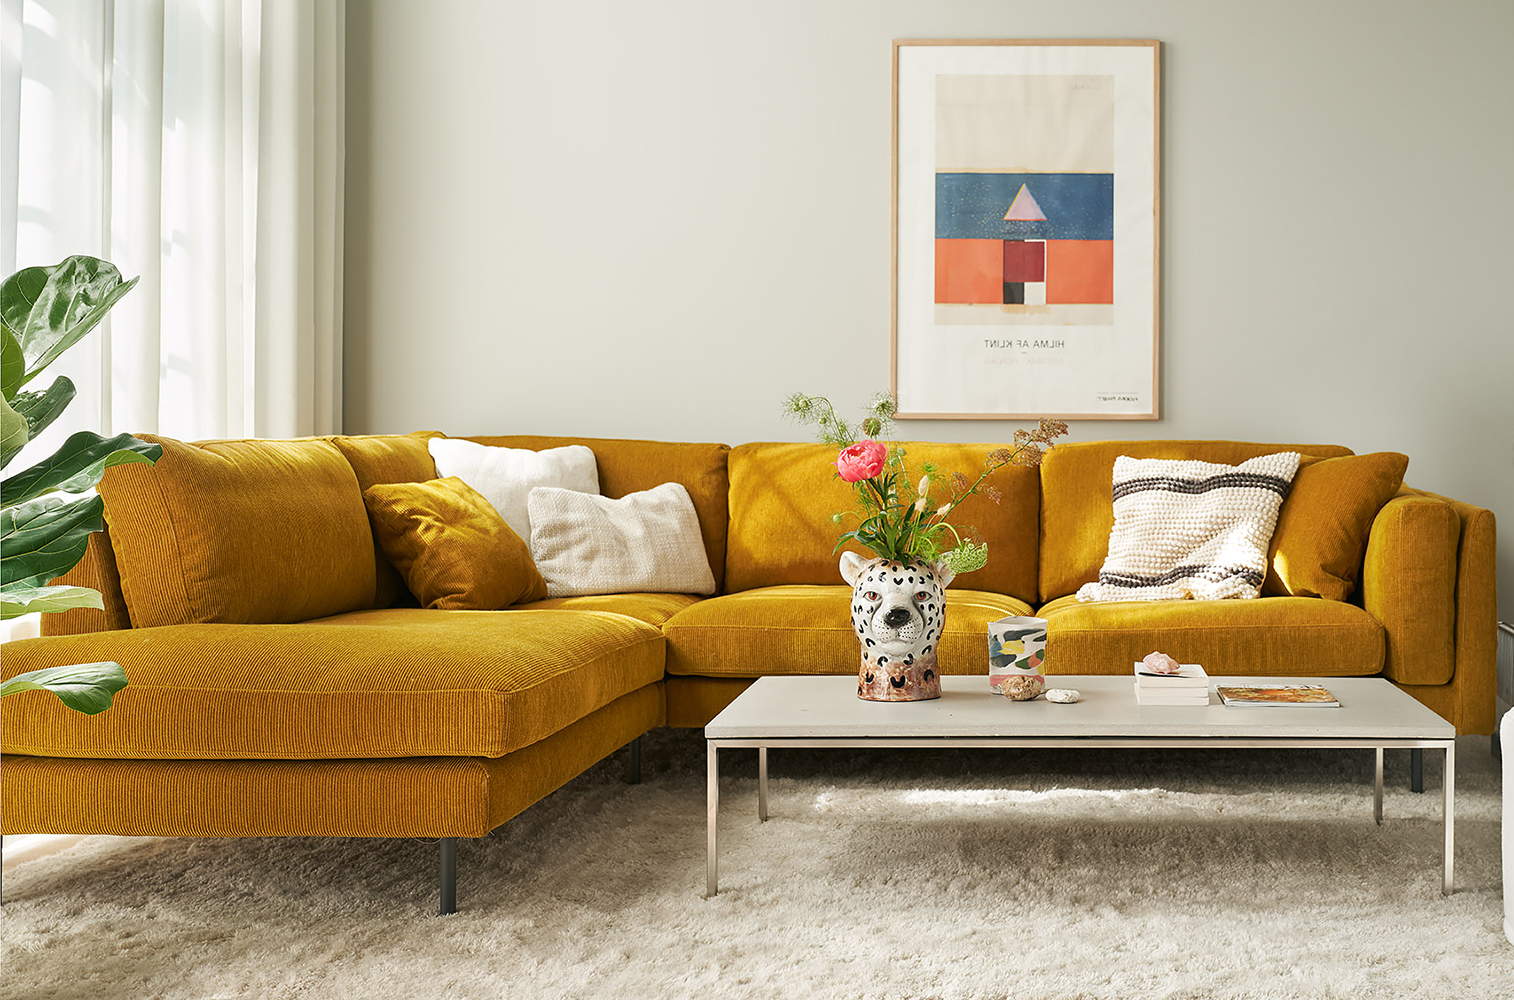 Modern Sofa Designs Interior Design Design News And Architecture Trends